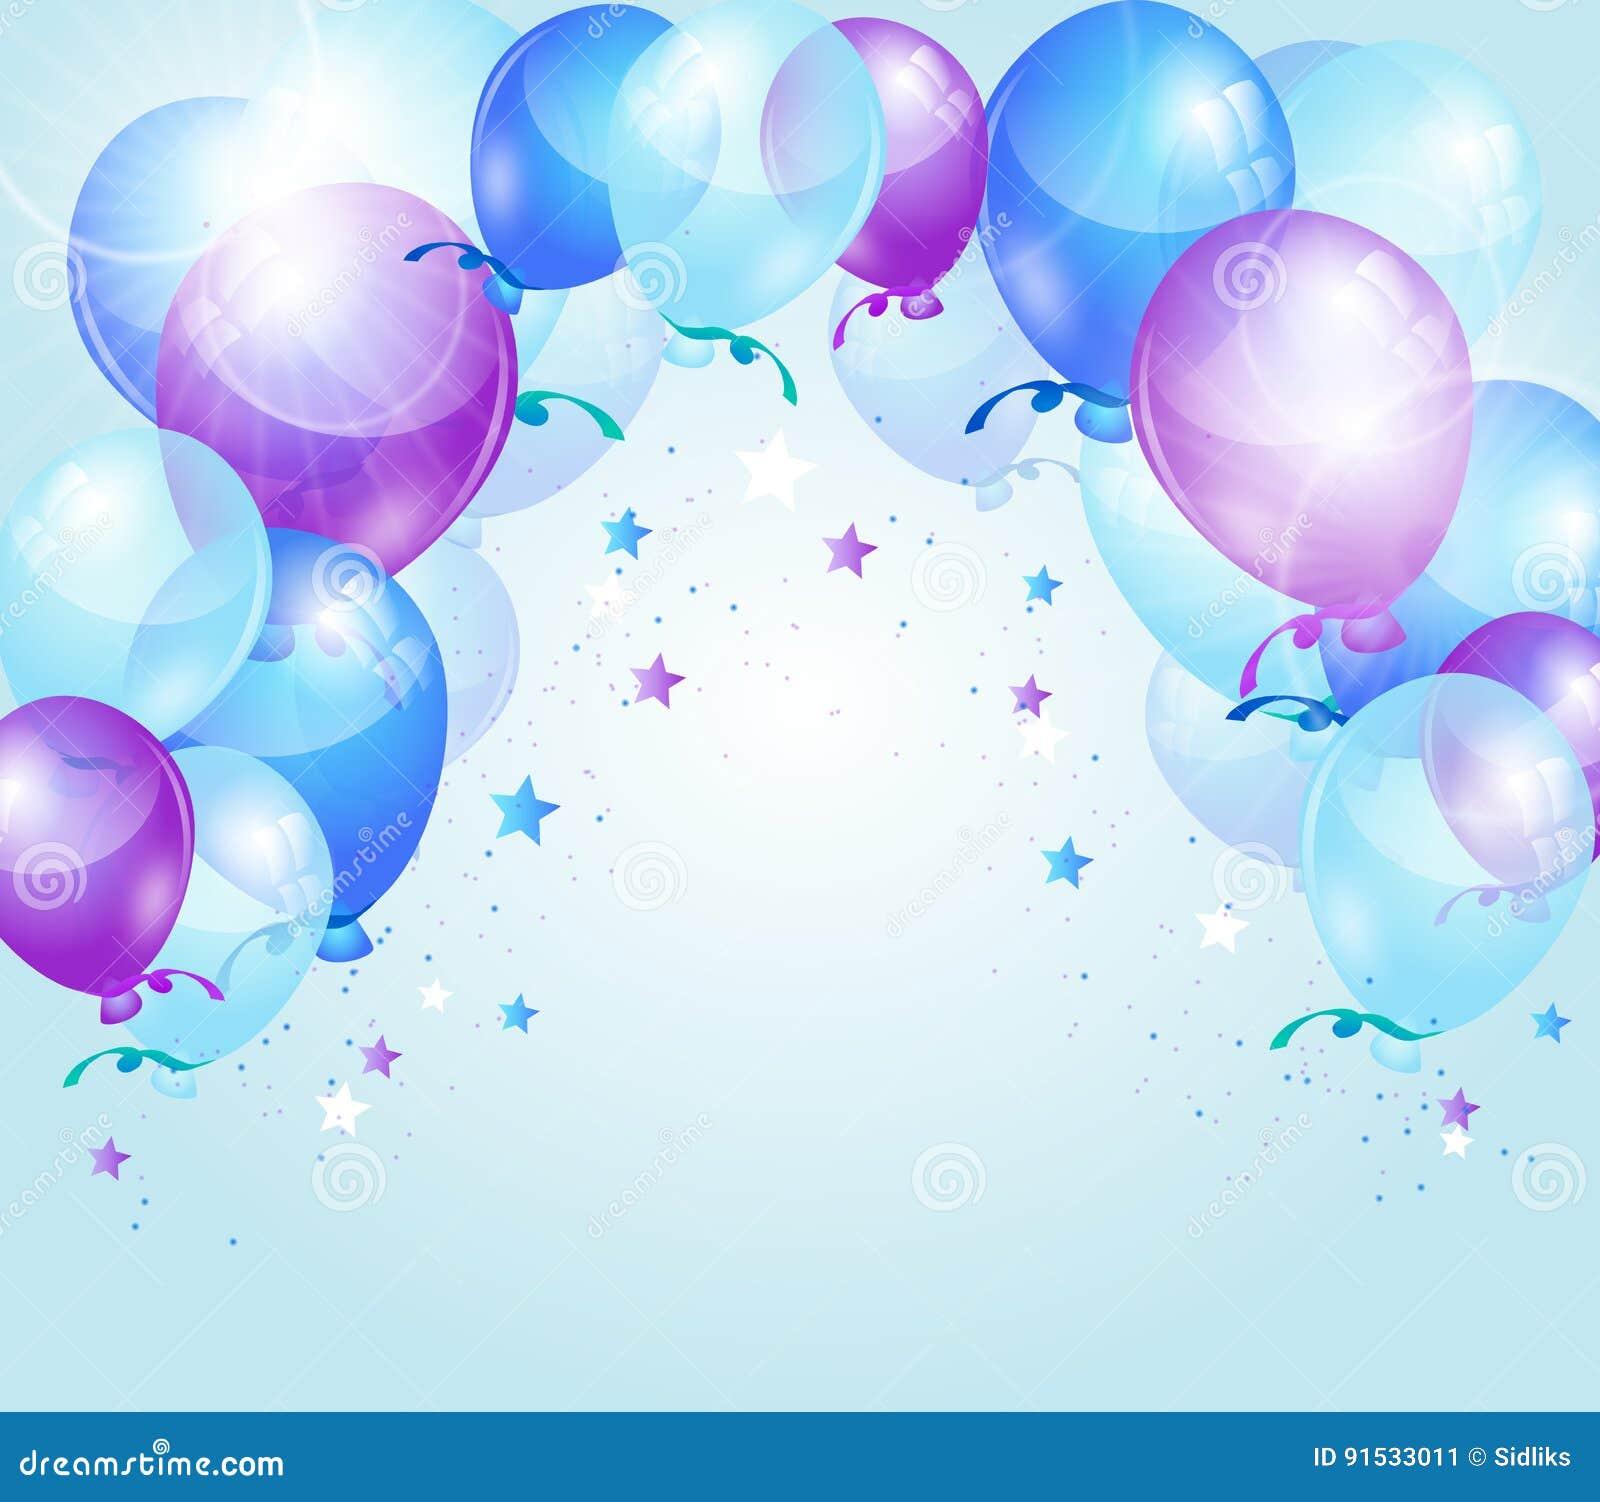 blue purple birthday background stock illustration image